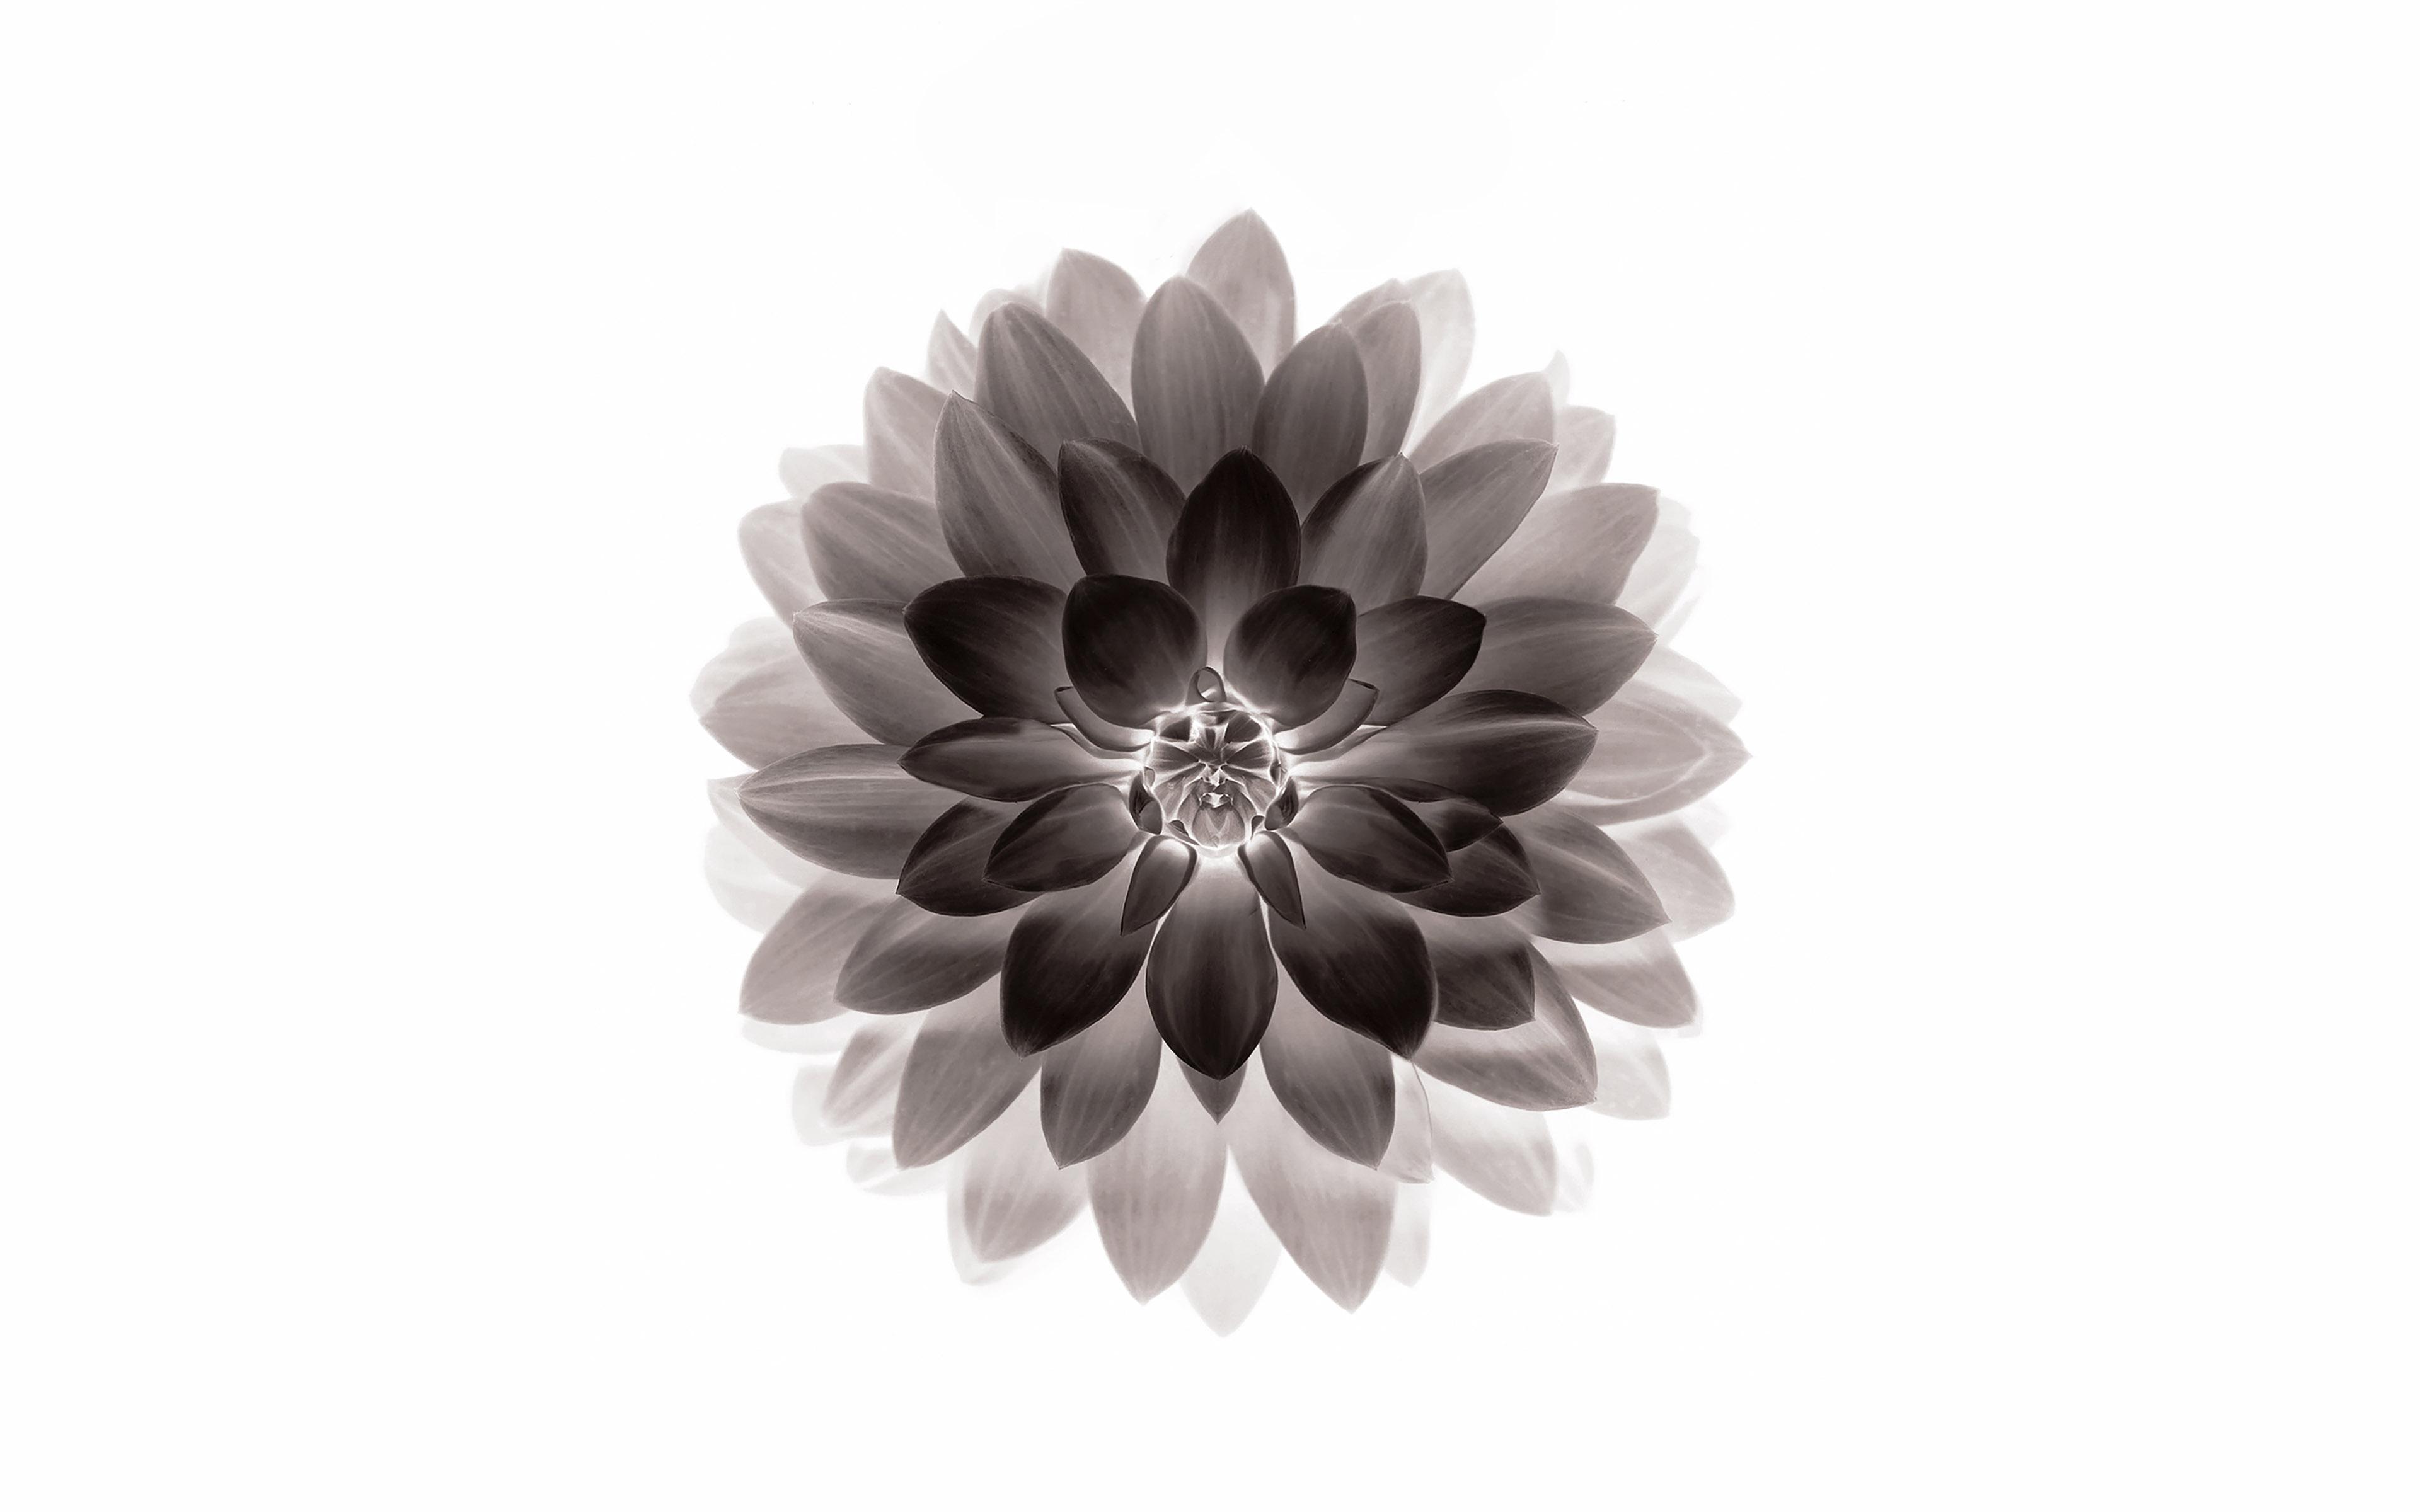 ad42-apple-black-lotus-iphone6-plus-ios8-flower - Papers.co